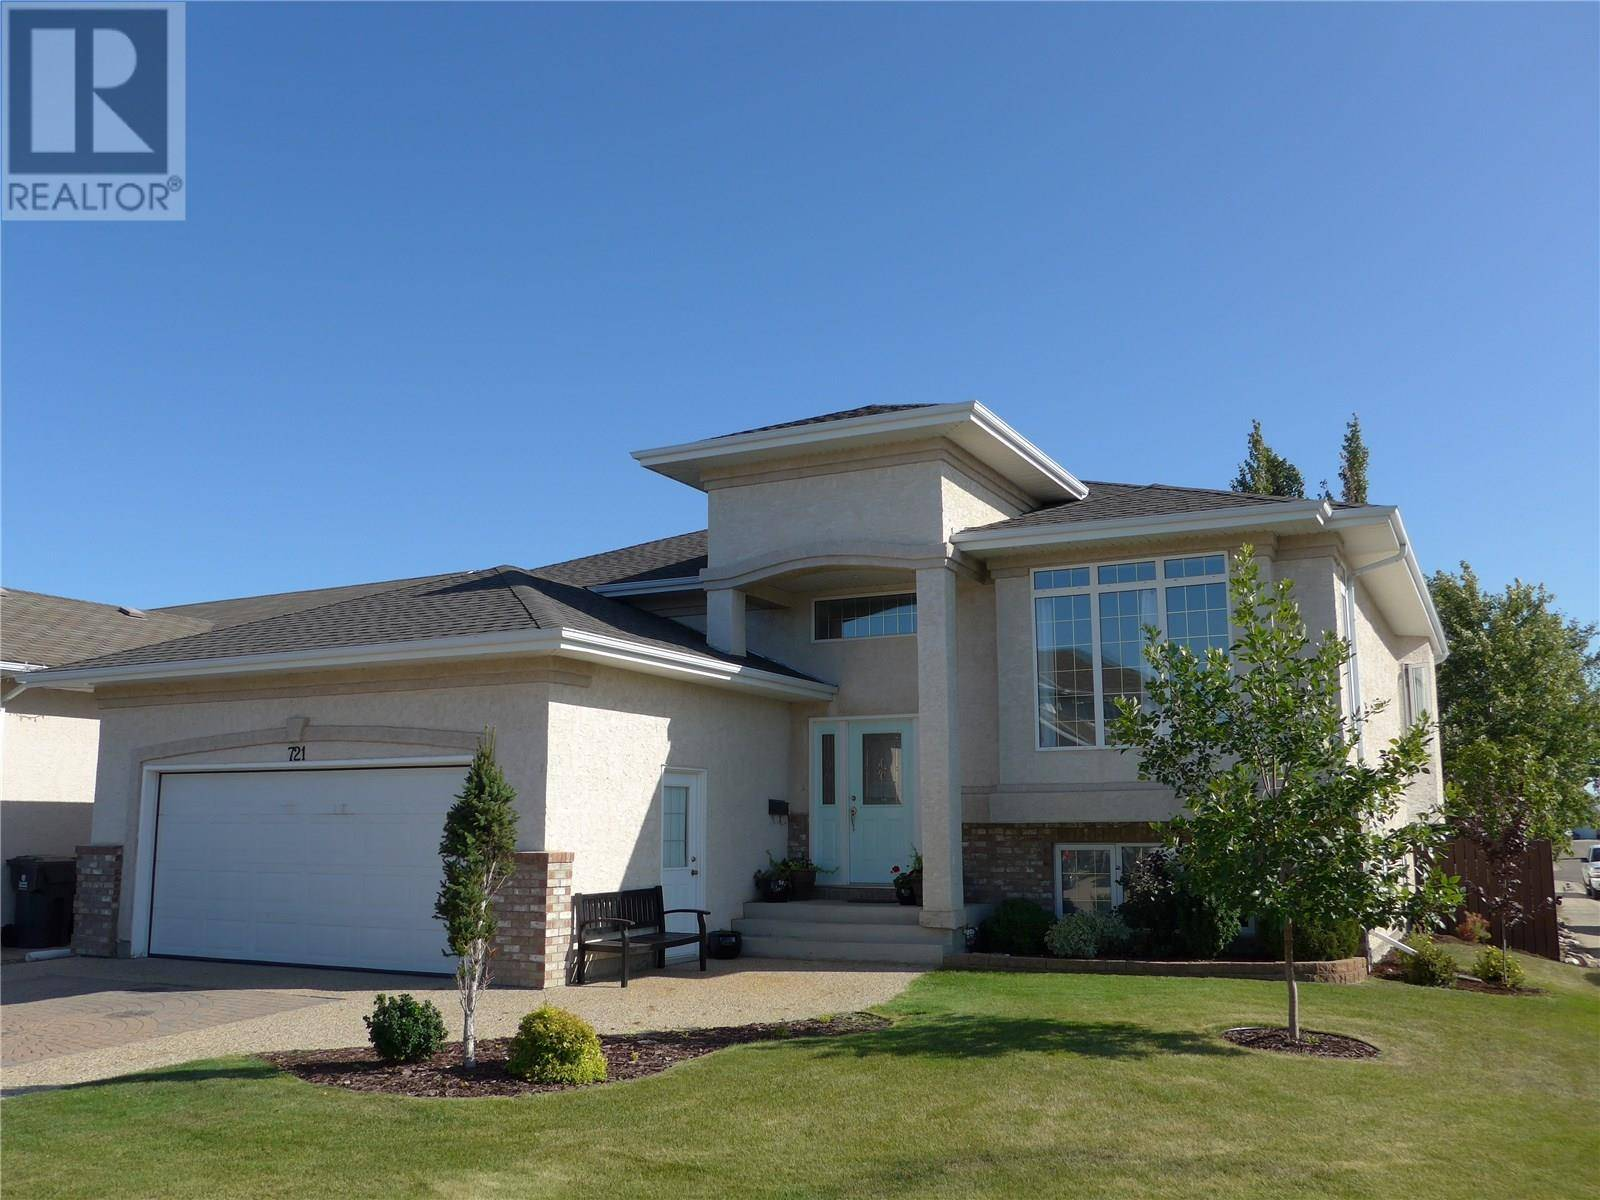 House for sale at 721 Murray Cres Warman Saskatchewan - MLS: SK784027